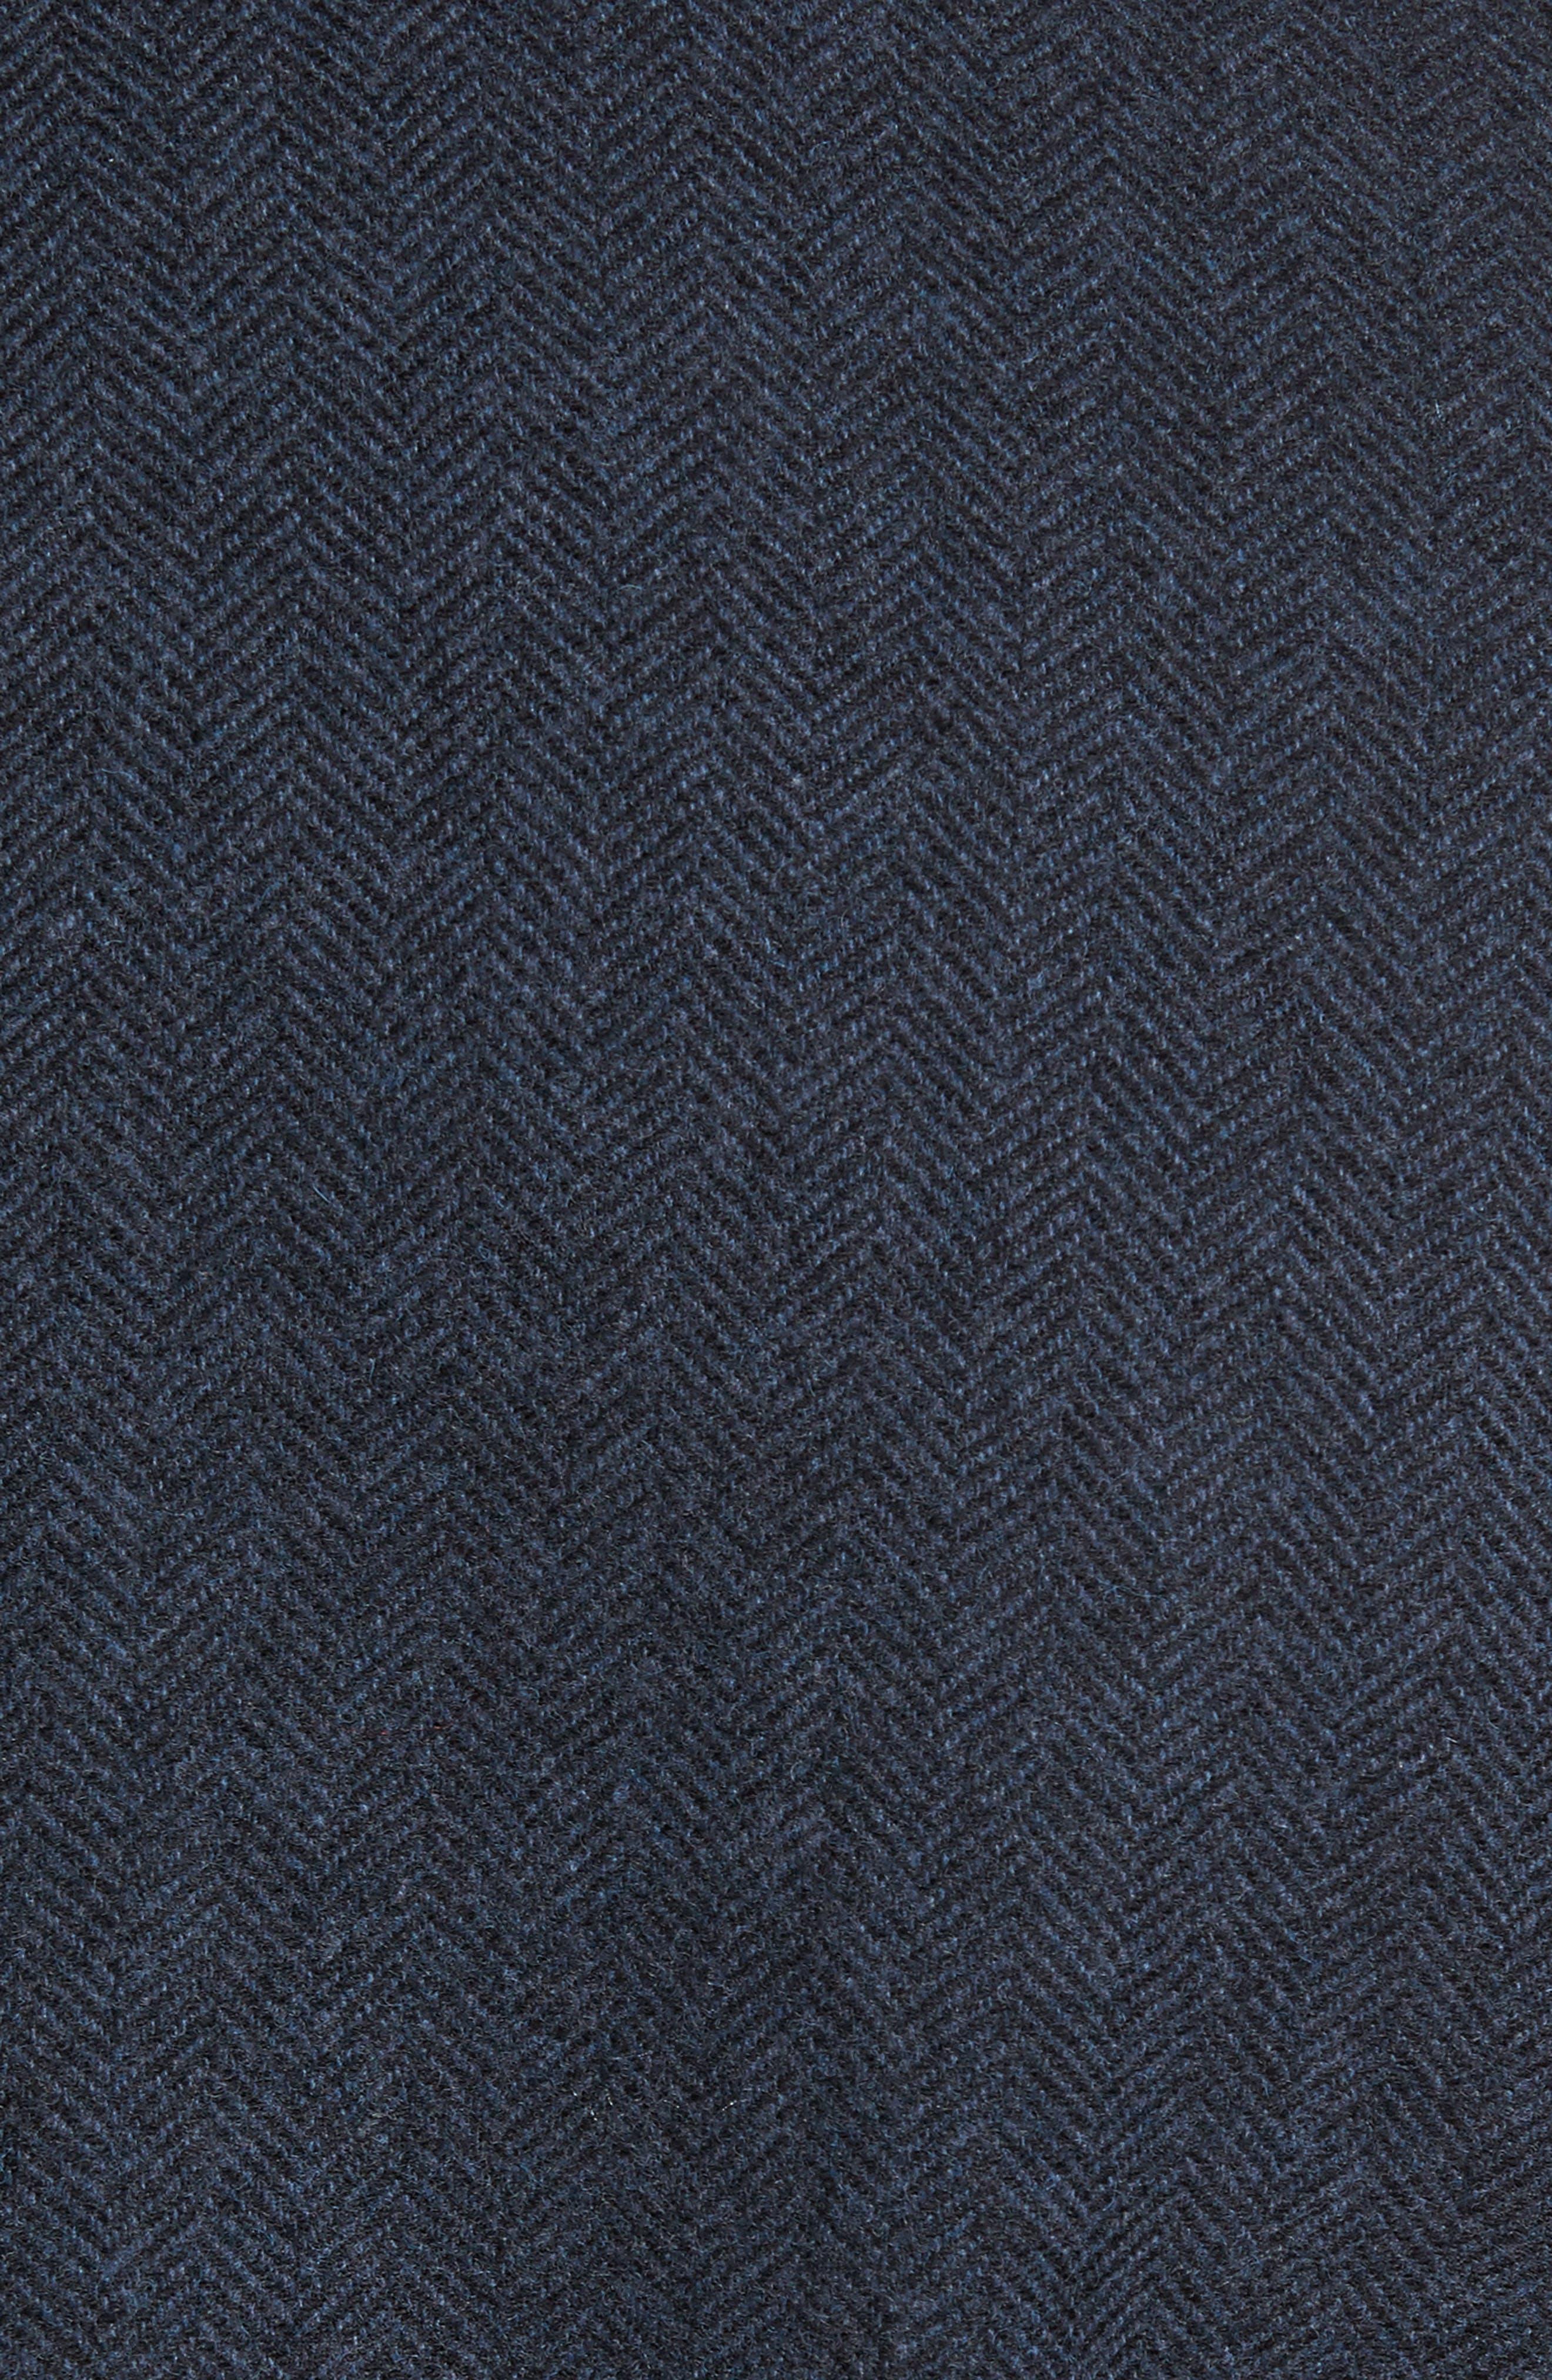 Porter Herringbone Wool Blend Jacket,                             Alternate thumbnail 5, color,                             410